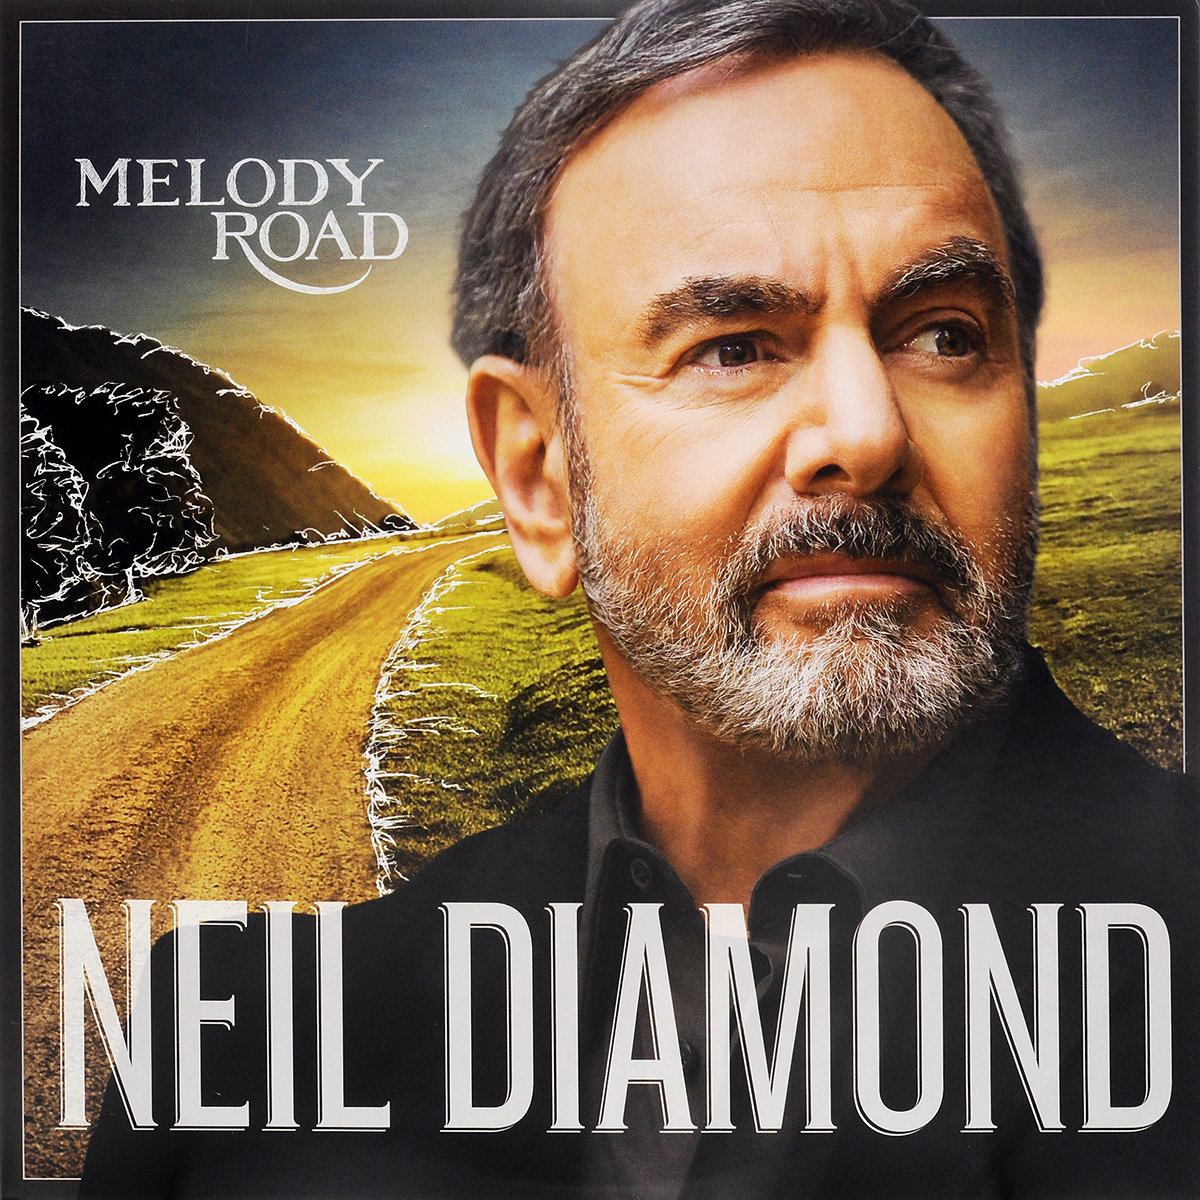 лучшая цена Нил Даймонд Neil Diamond. Melody Road (2 LP)